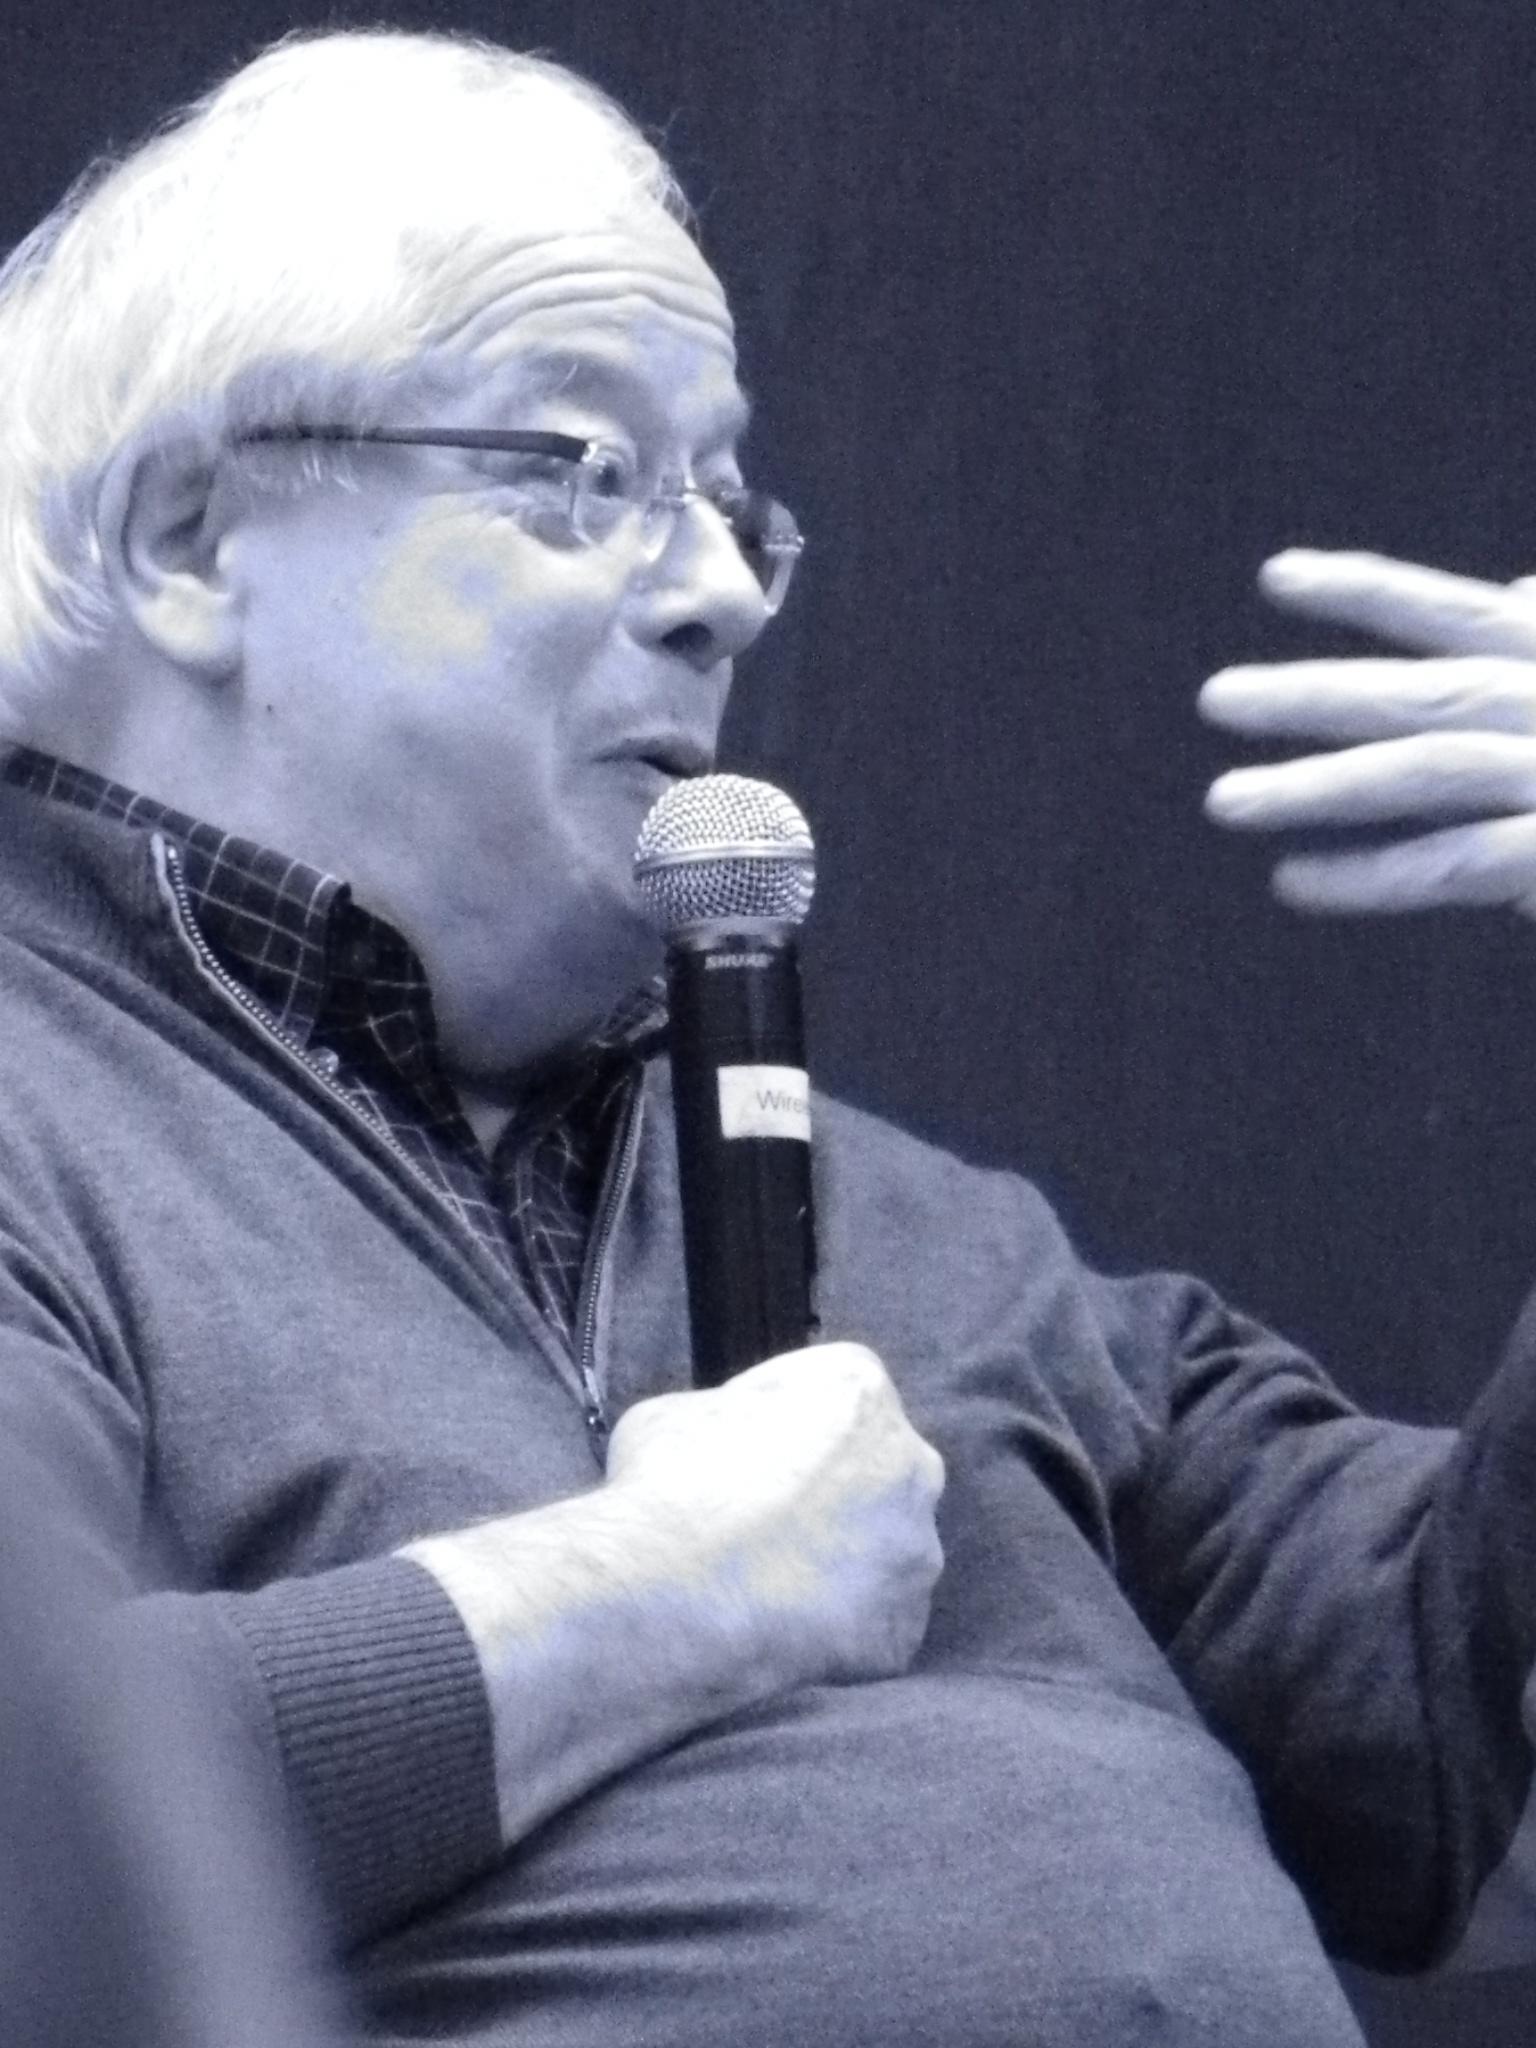 Thomson speaking in New York, 2013